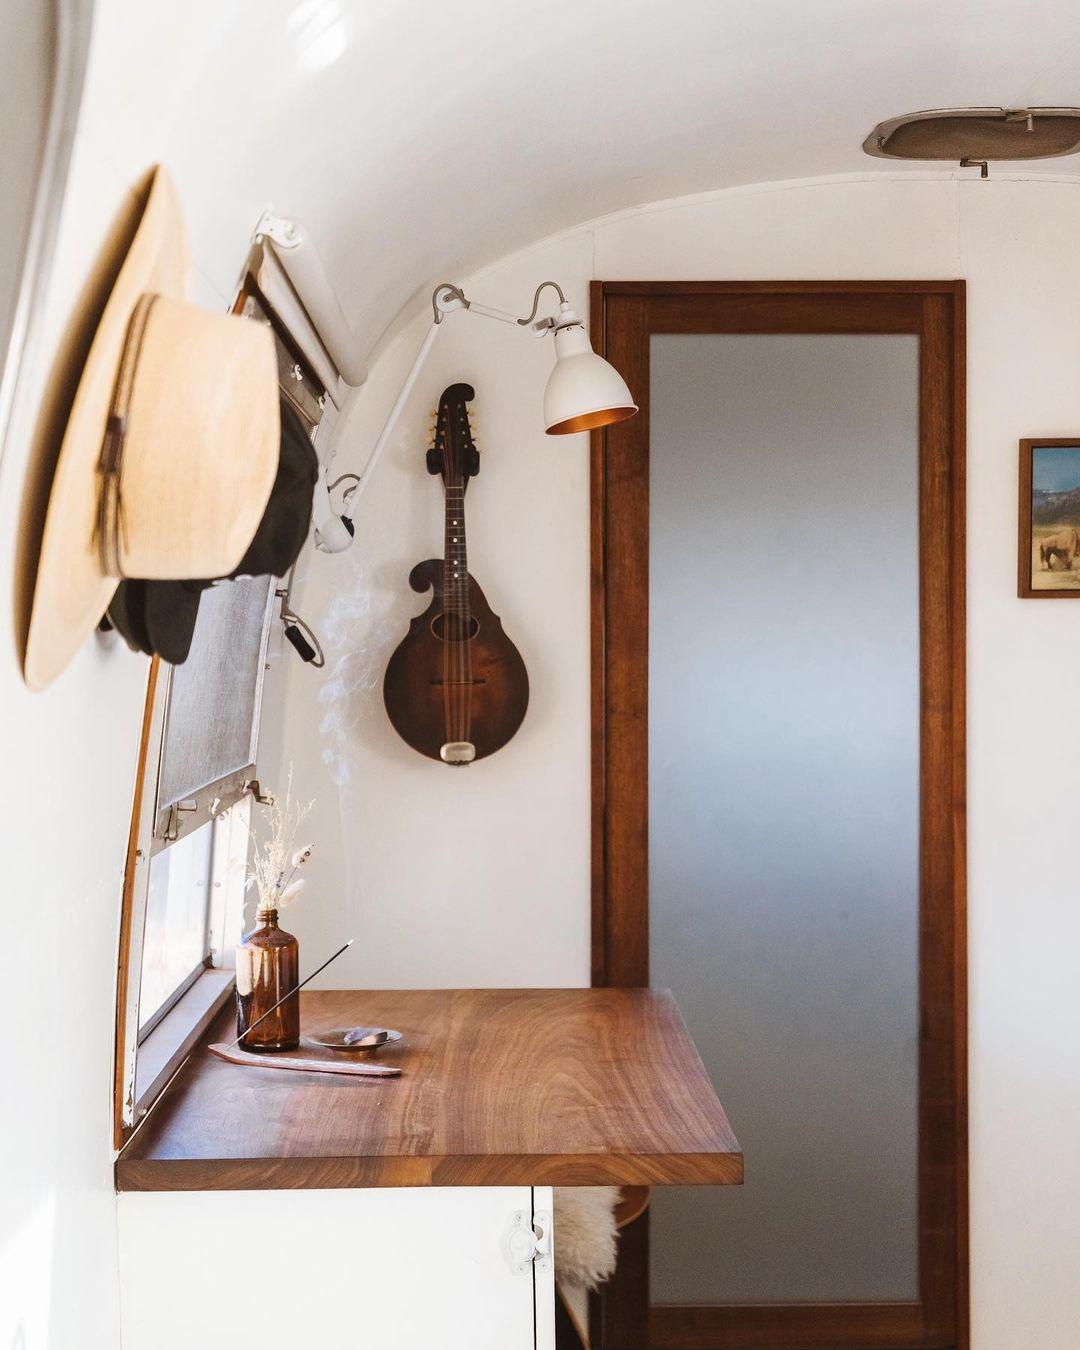 airstream trailer 2 - Interior designer turned heirloom Airstream into delightful home